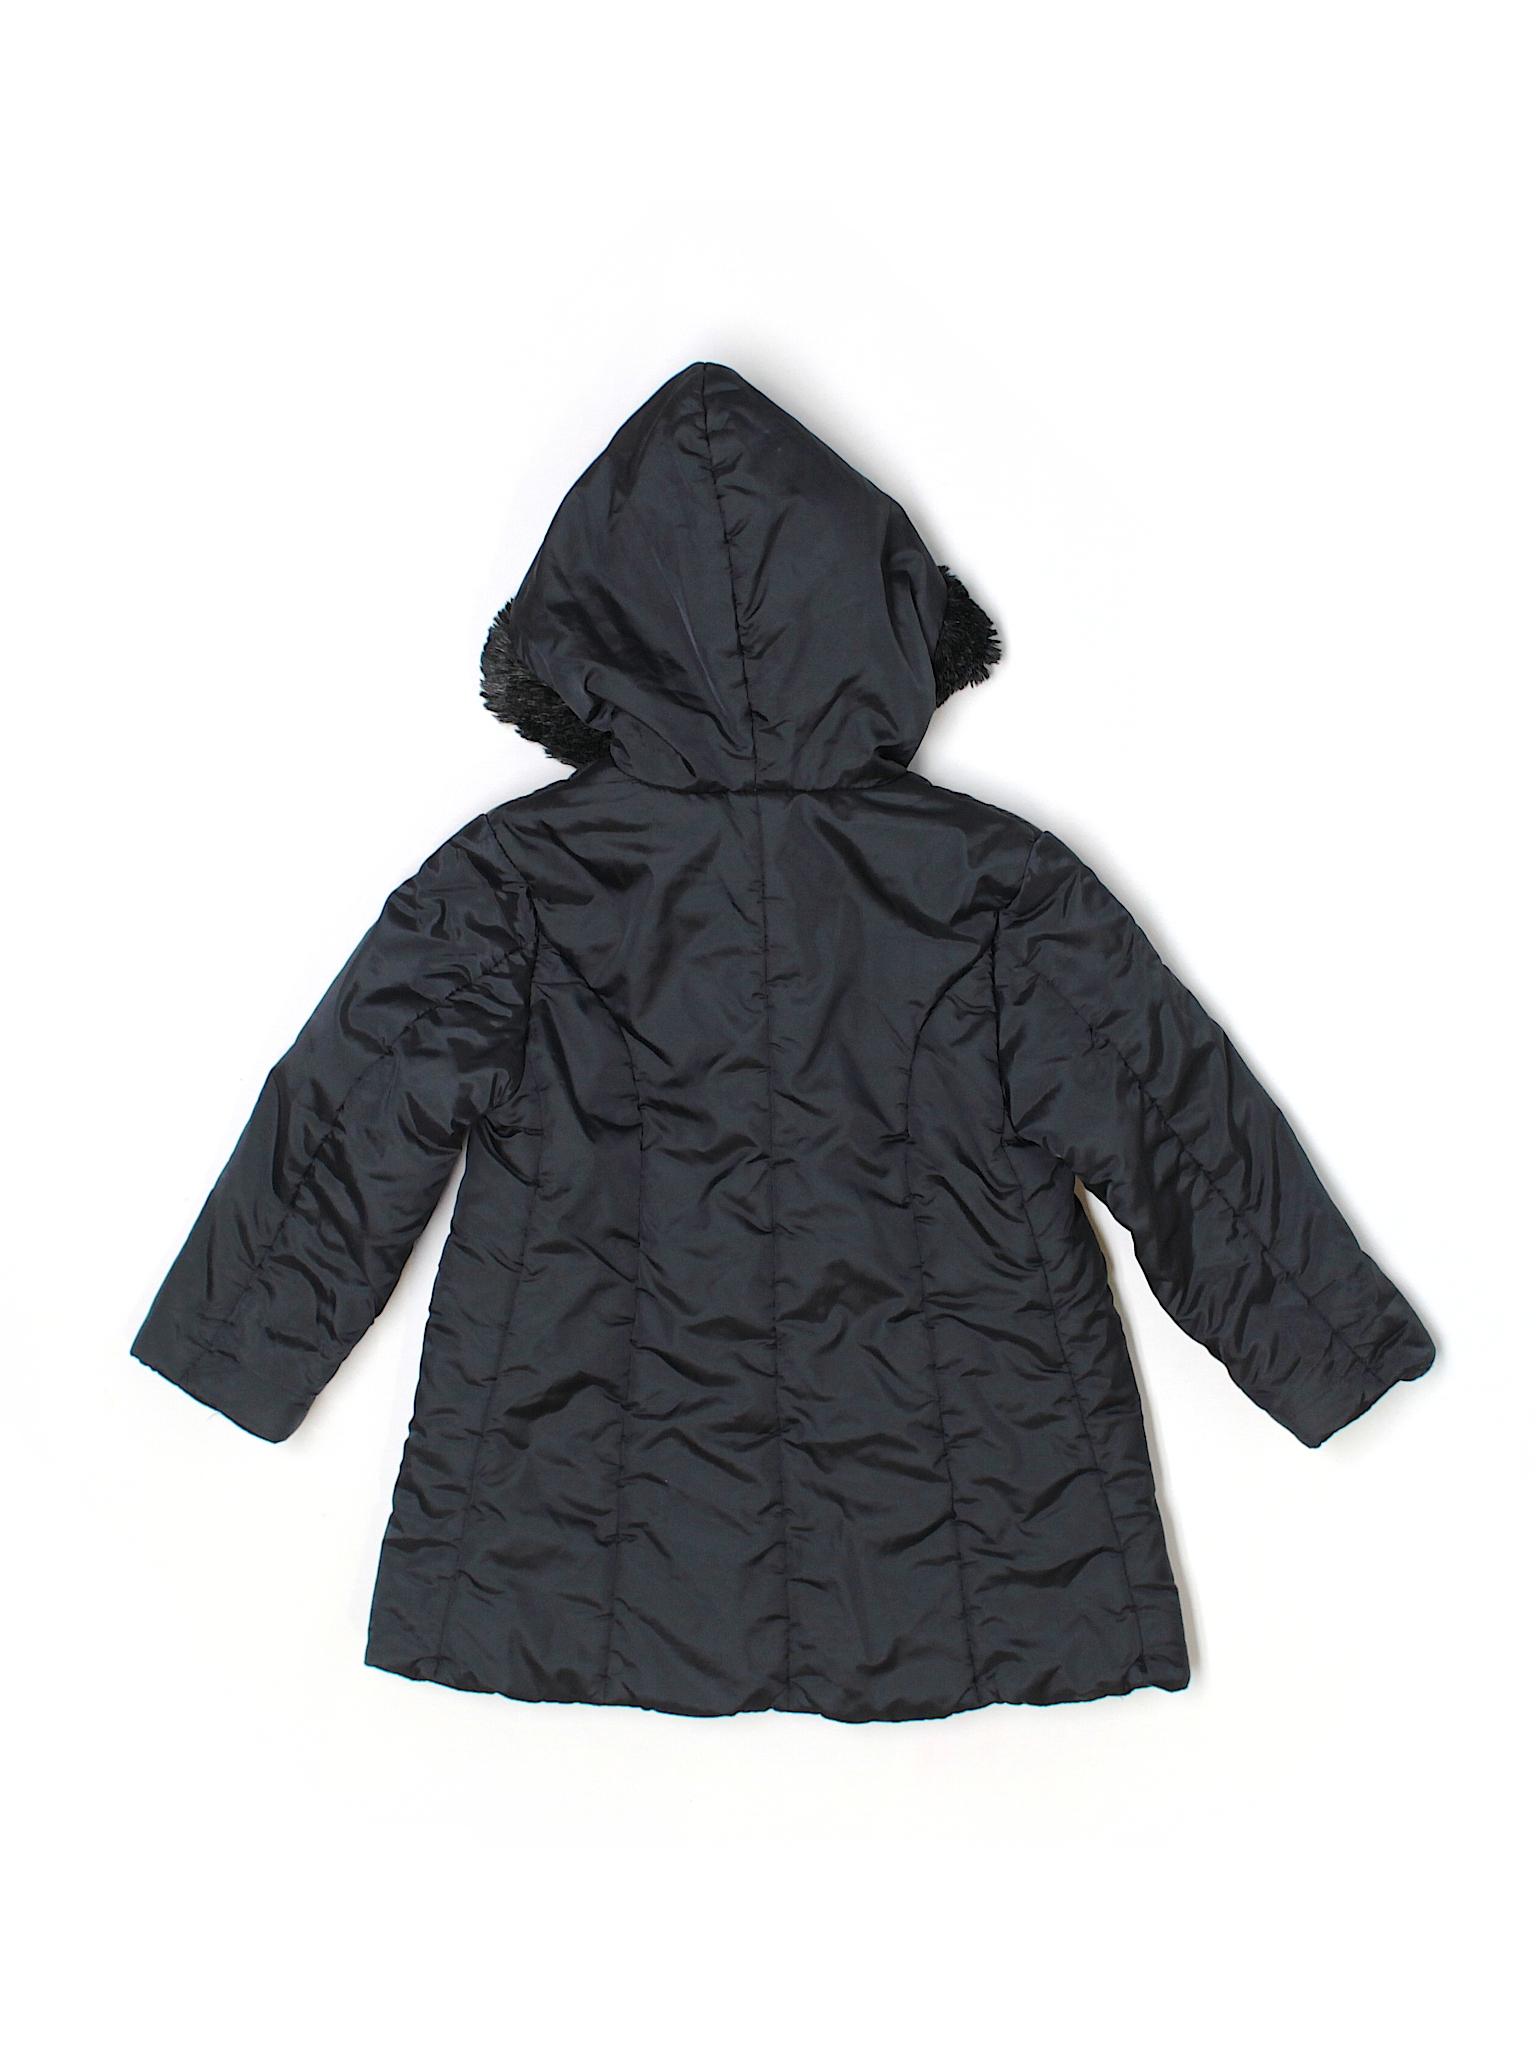 6f81d24b7 CMCR kids Solid Black Coat Size 3 - 78% off